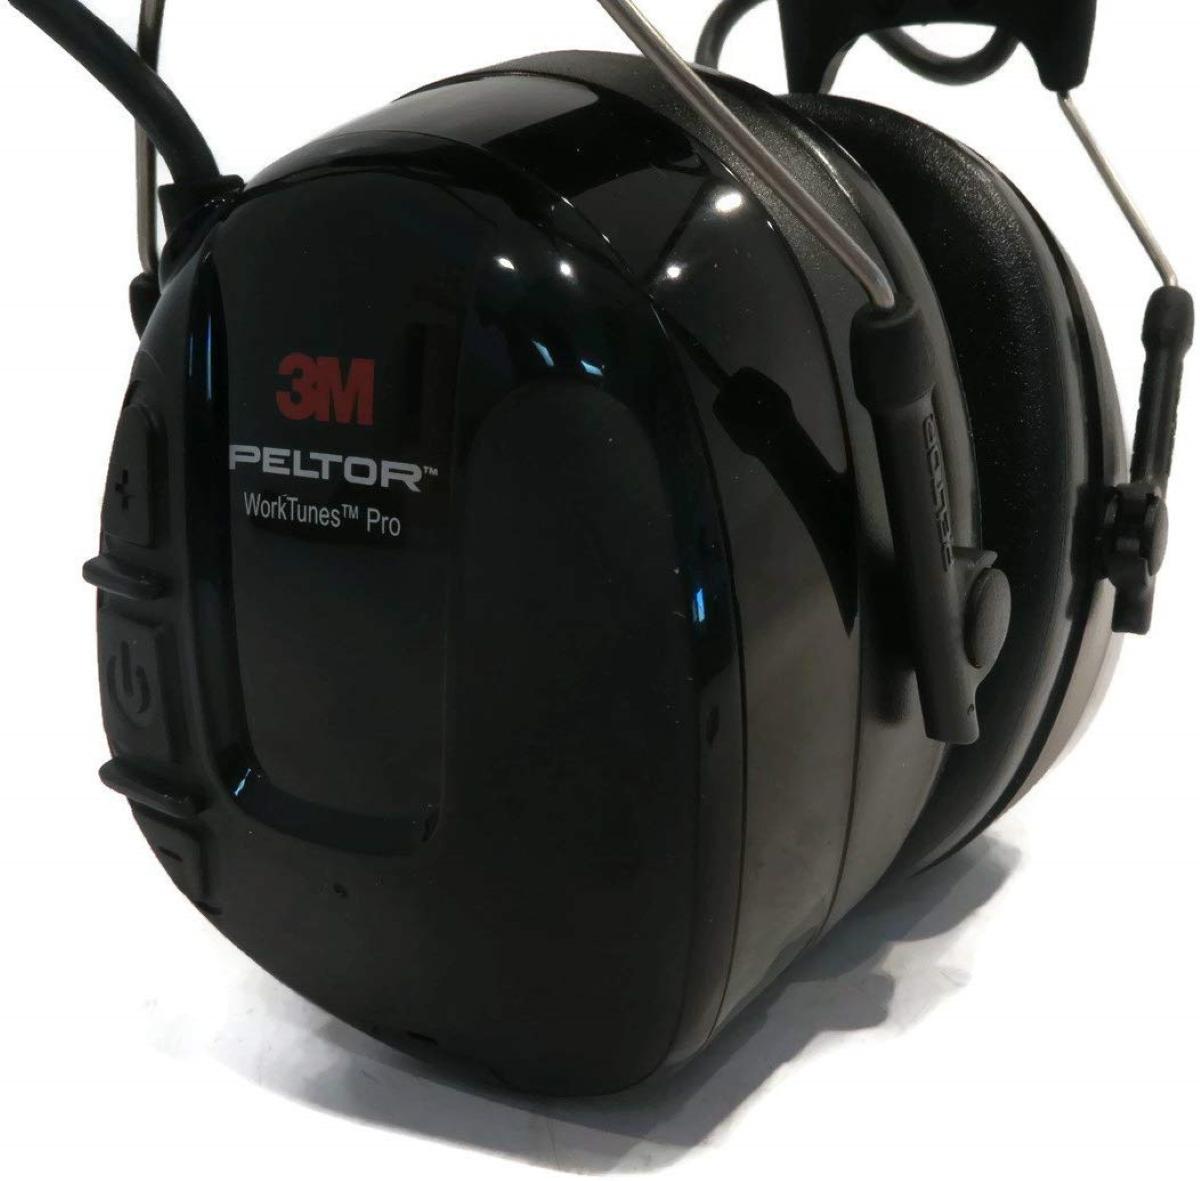 3M Peltor WorkTunes Noise Cancelling Radio Headphones